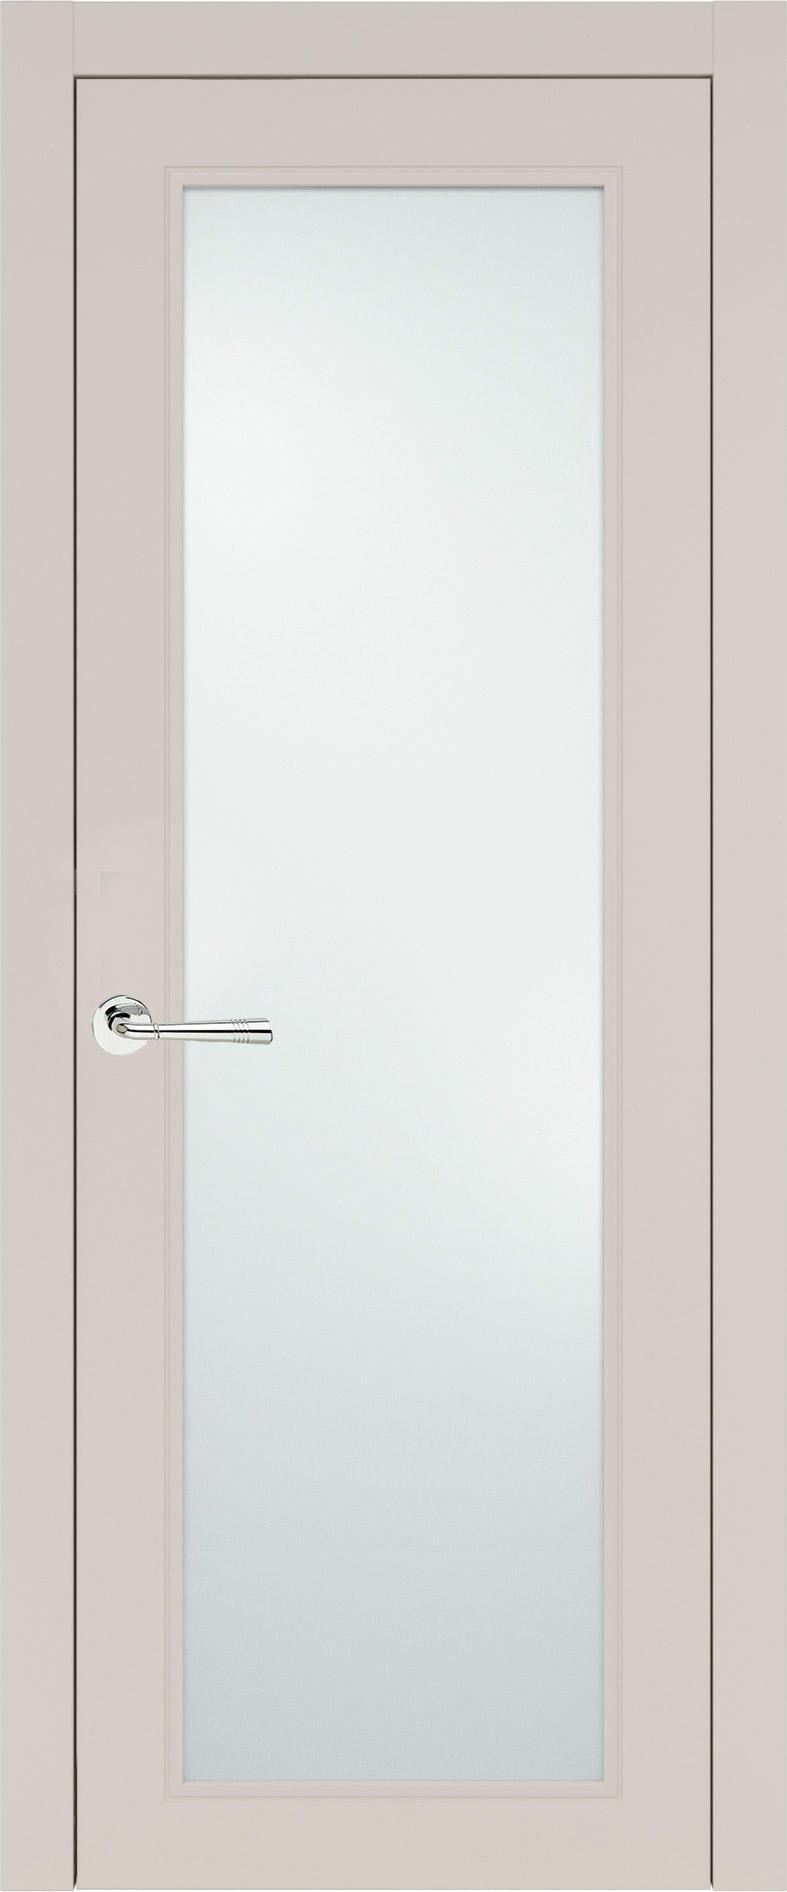 Domenica Neo Classic цвет - Жемчужная эмаль (RAL 1013) Со стеклом (ДО)